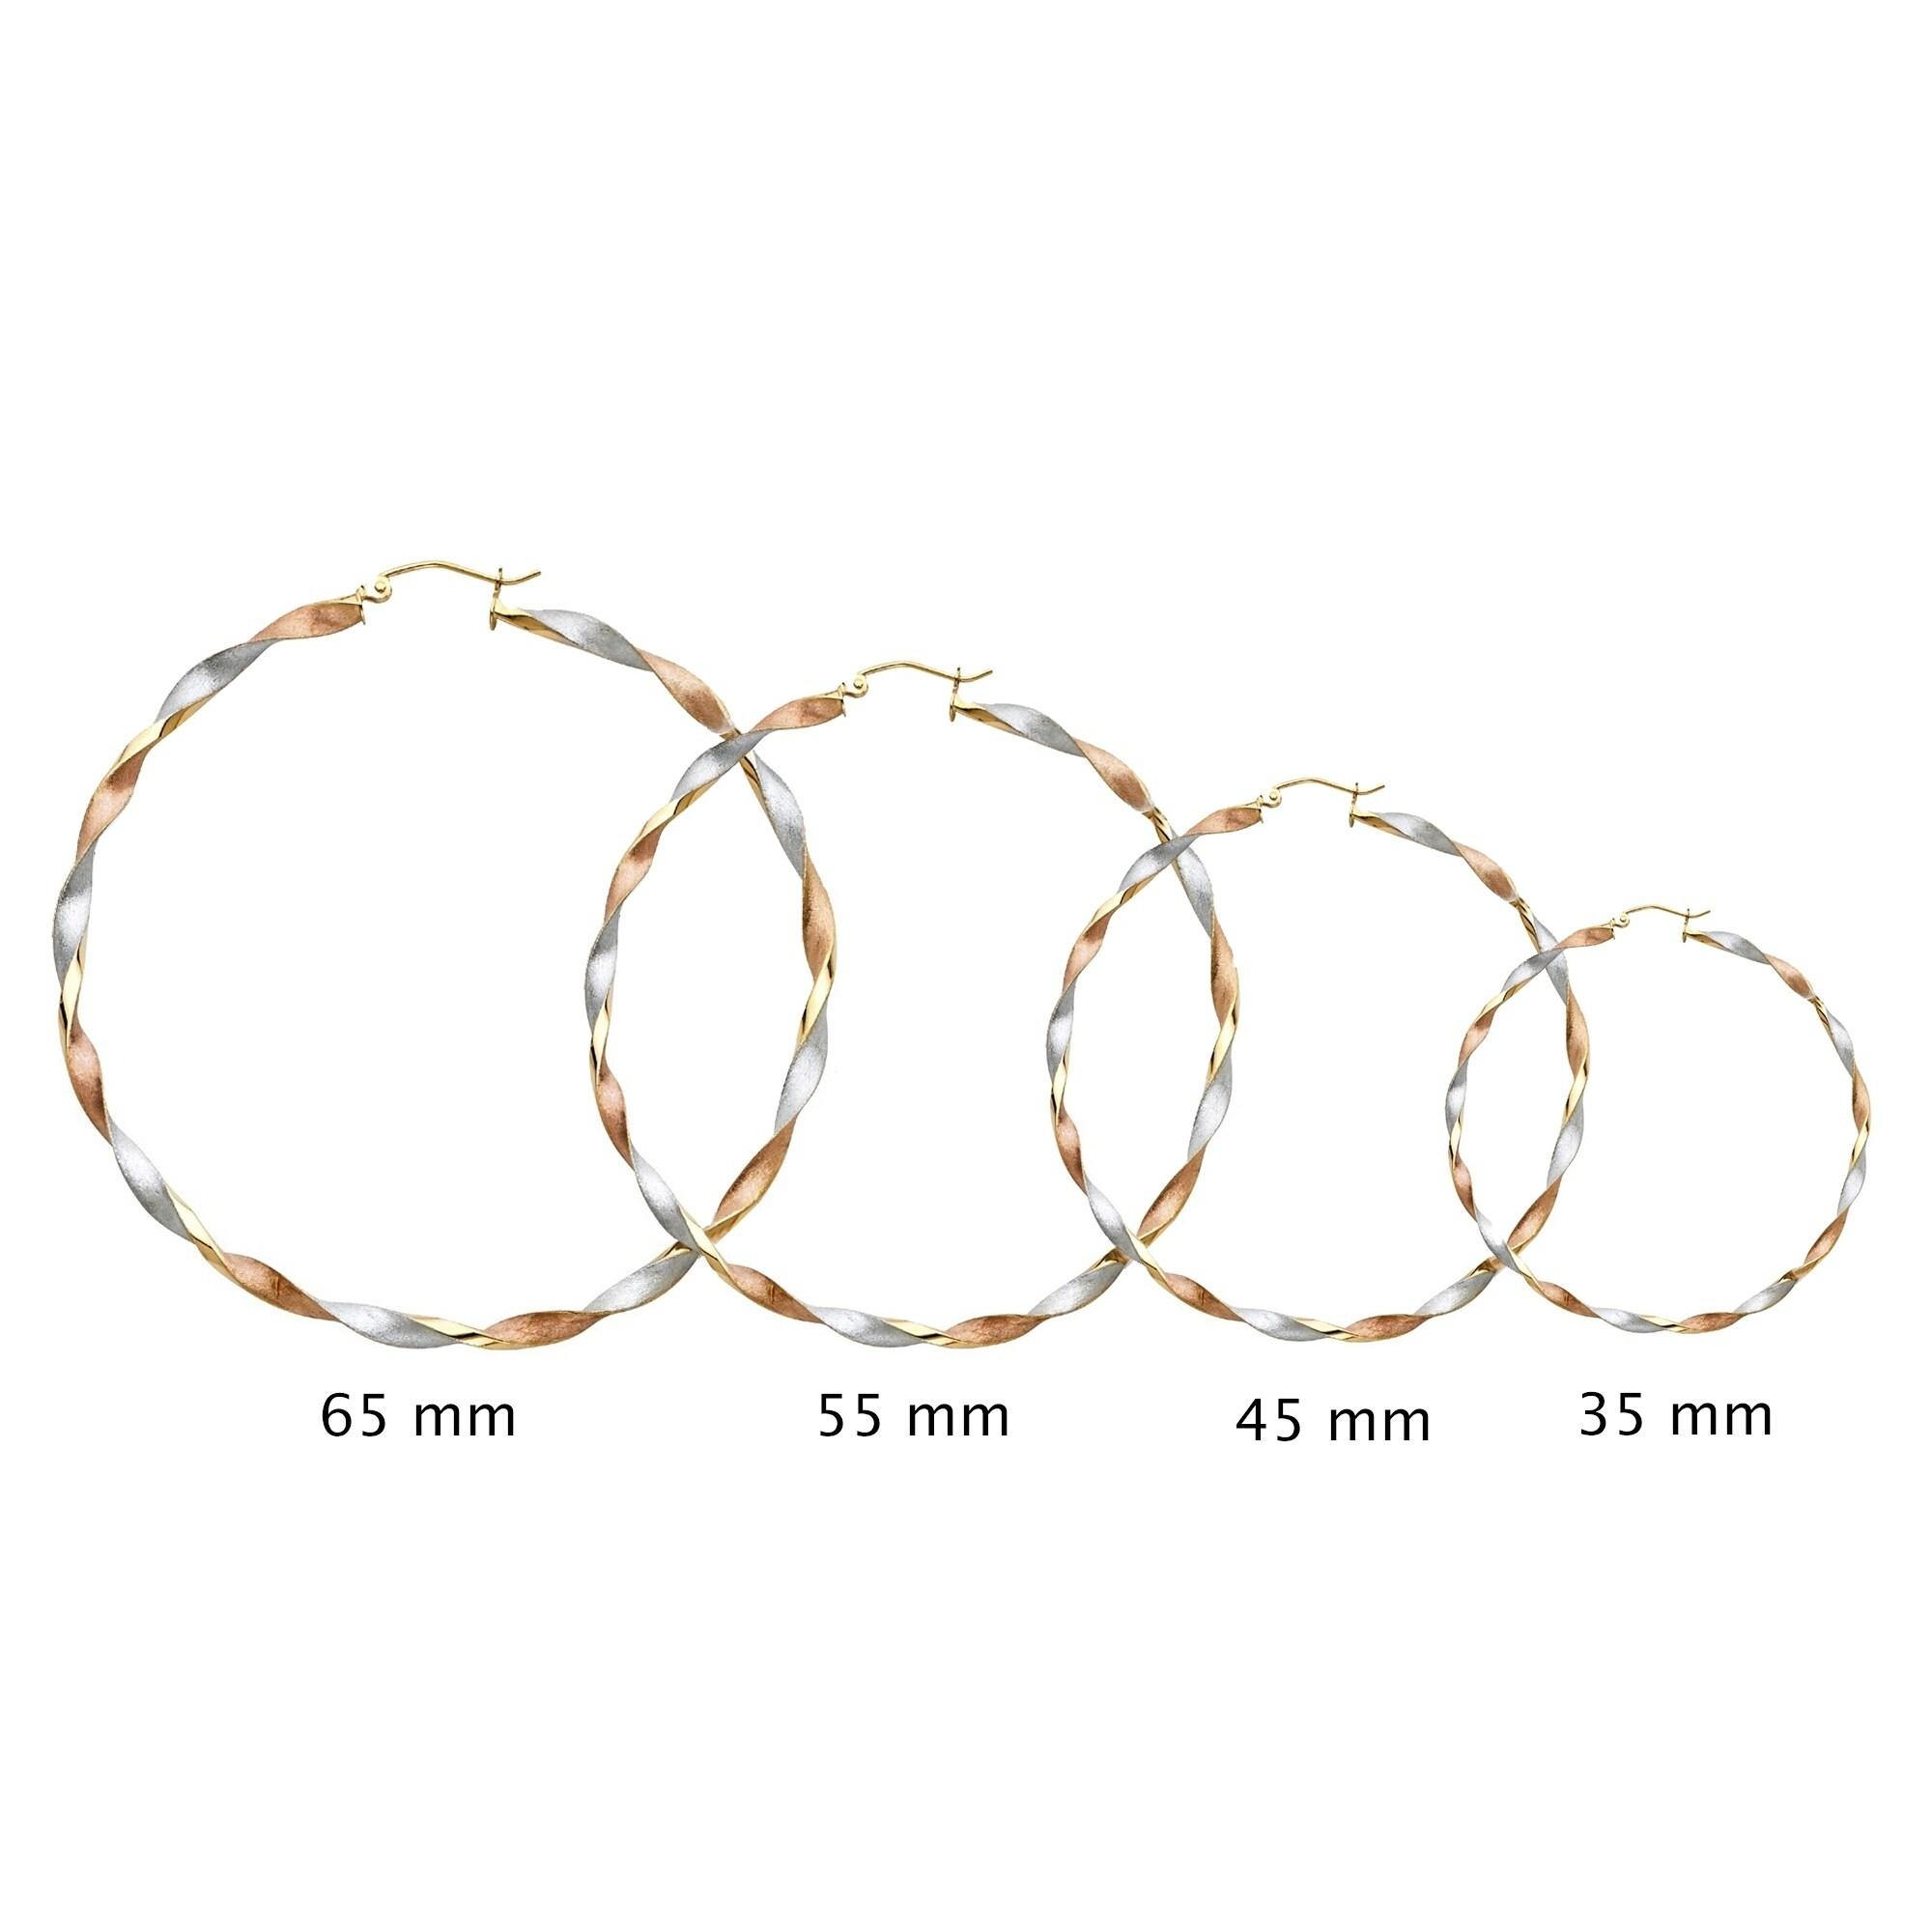 45mm X 45mm 14k 3mm Thick Tri-Color Gold Diamond-Cut Hoop Earrings,